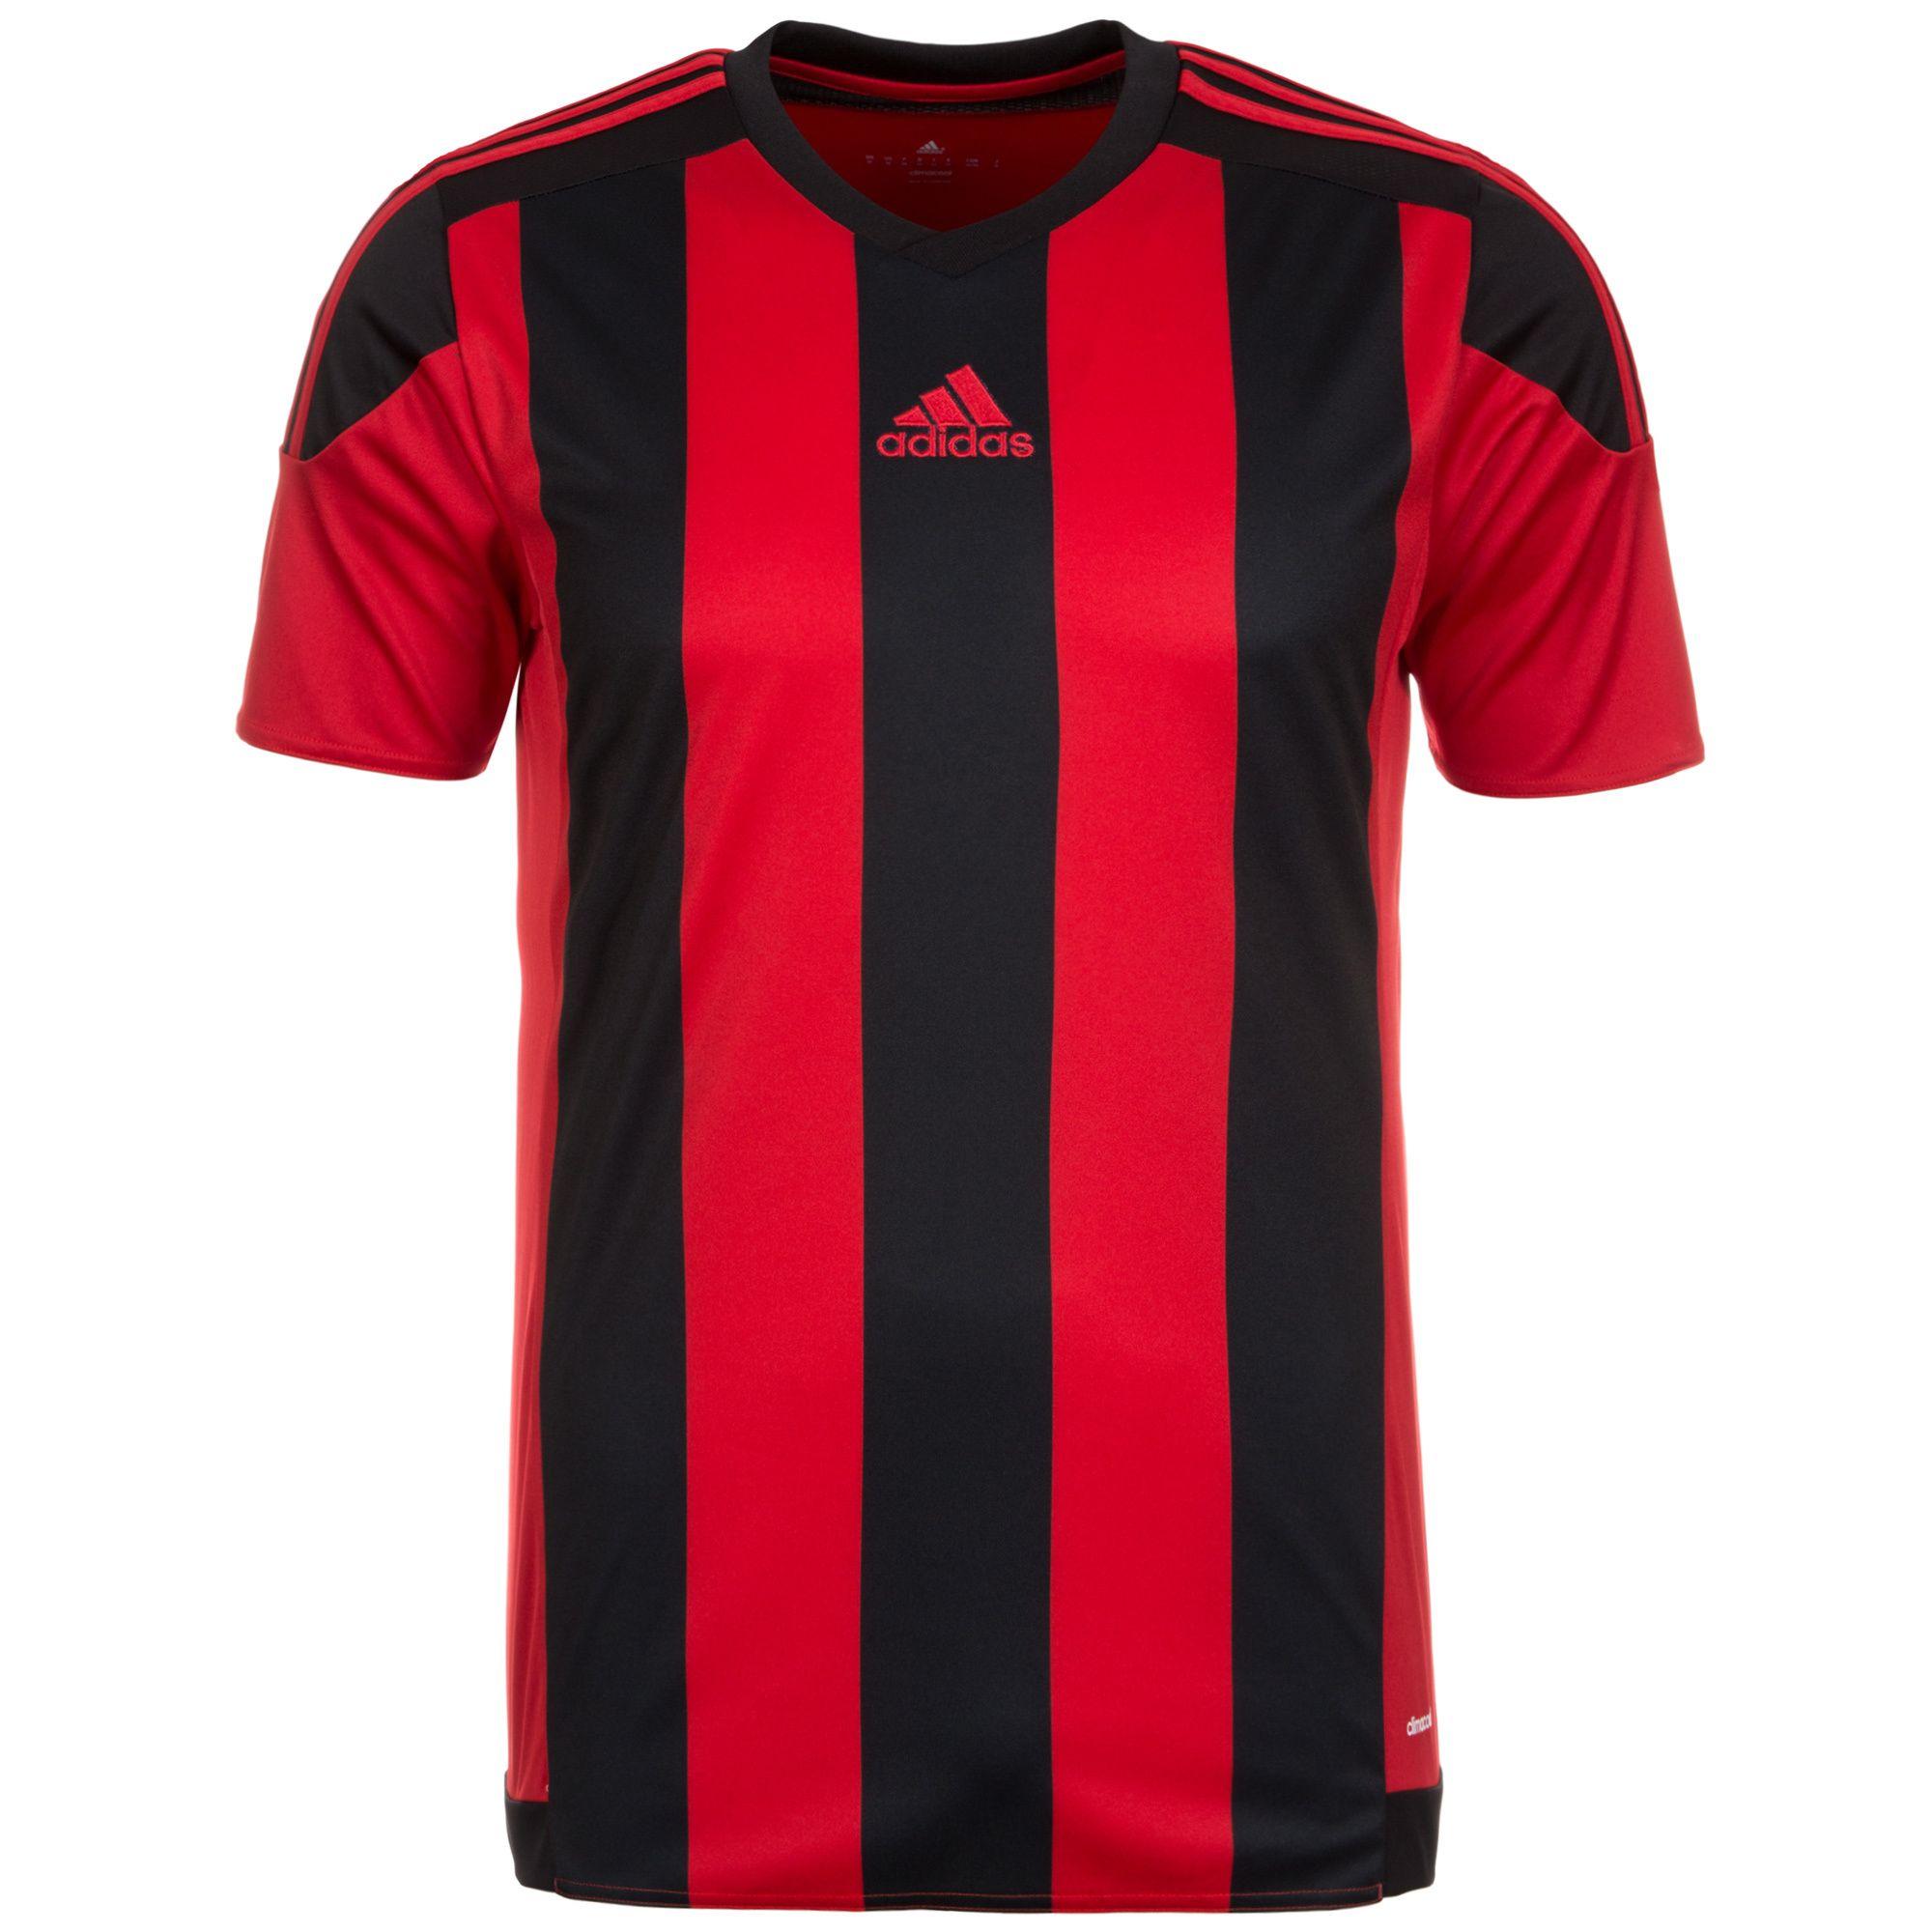 ADIDAS PERFORMANCE adidas Performance Striped 15 Fußballtrikot Herren